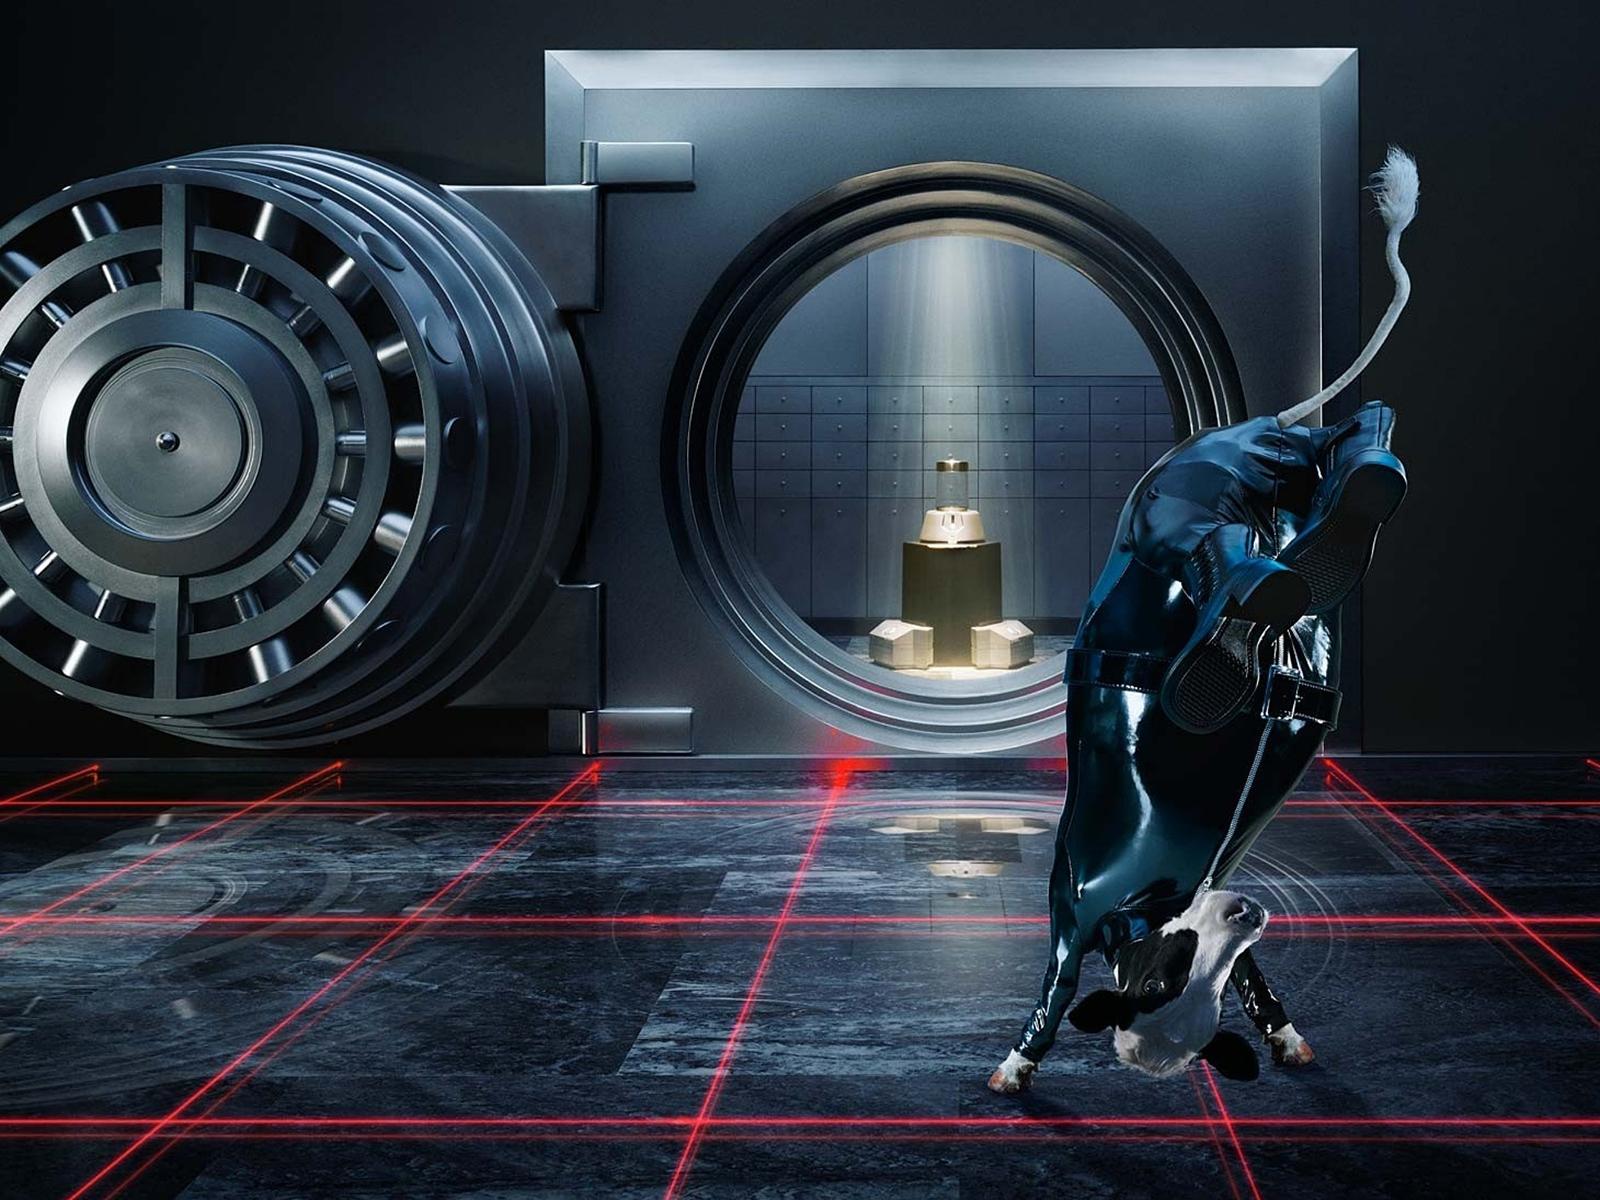 Safe Vault Cow Jump Spy Laser WTF wallpaper 1600x1200 125720 1600x1200